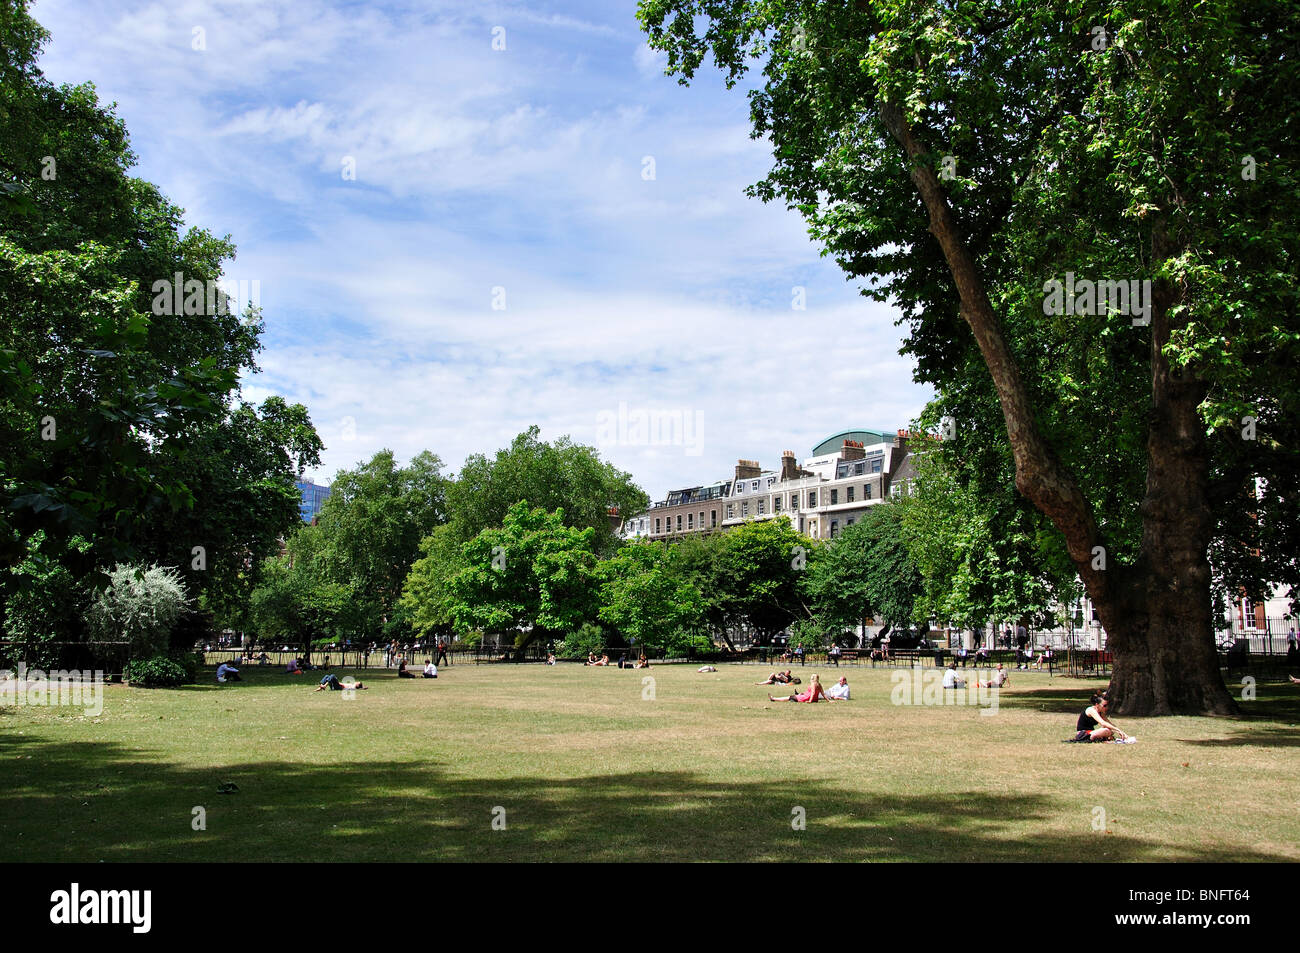 Lincoln es Inn Fields, Holborn, London Borough of Camden, Greater London, England, Vereinigtes Königreich Stockfoto